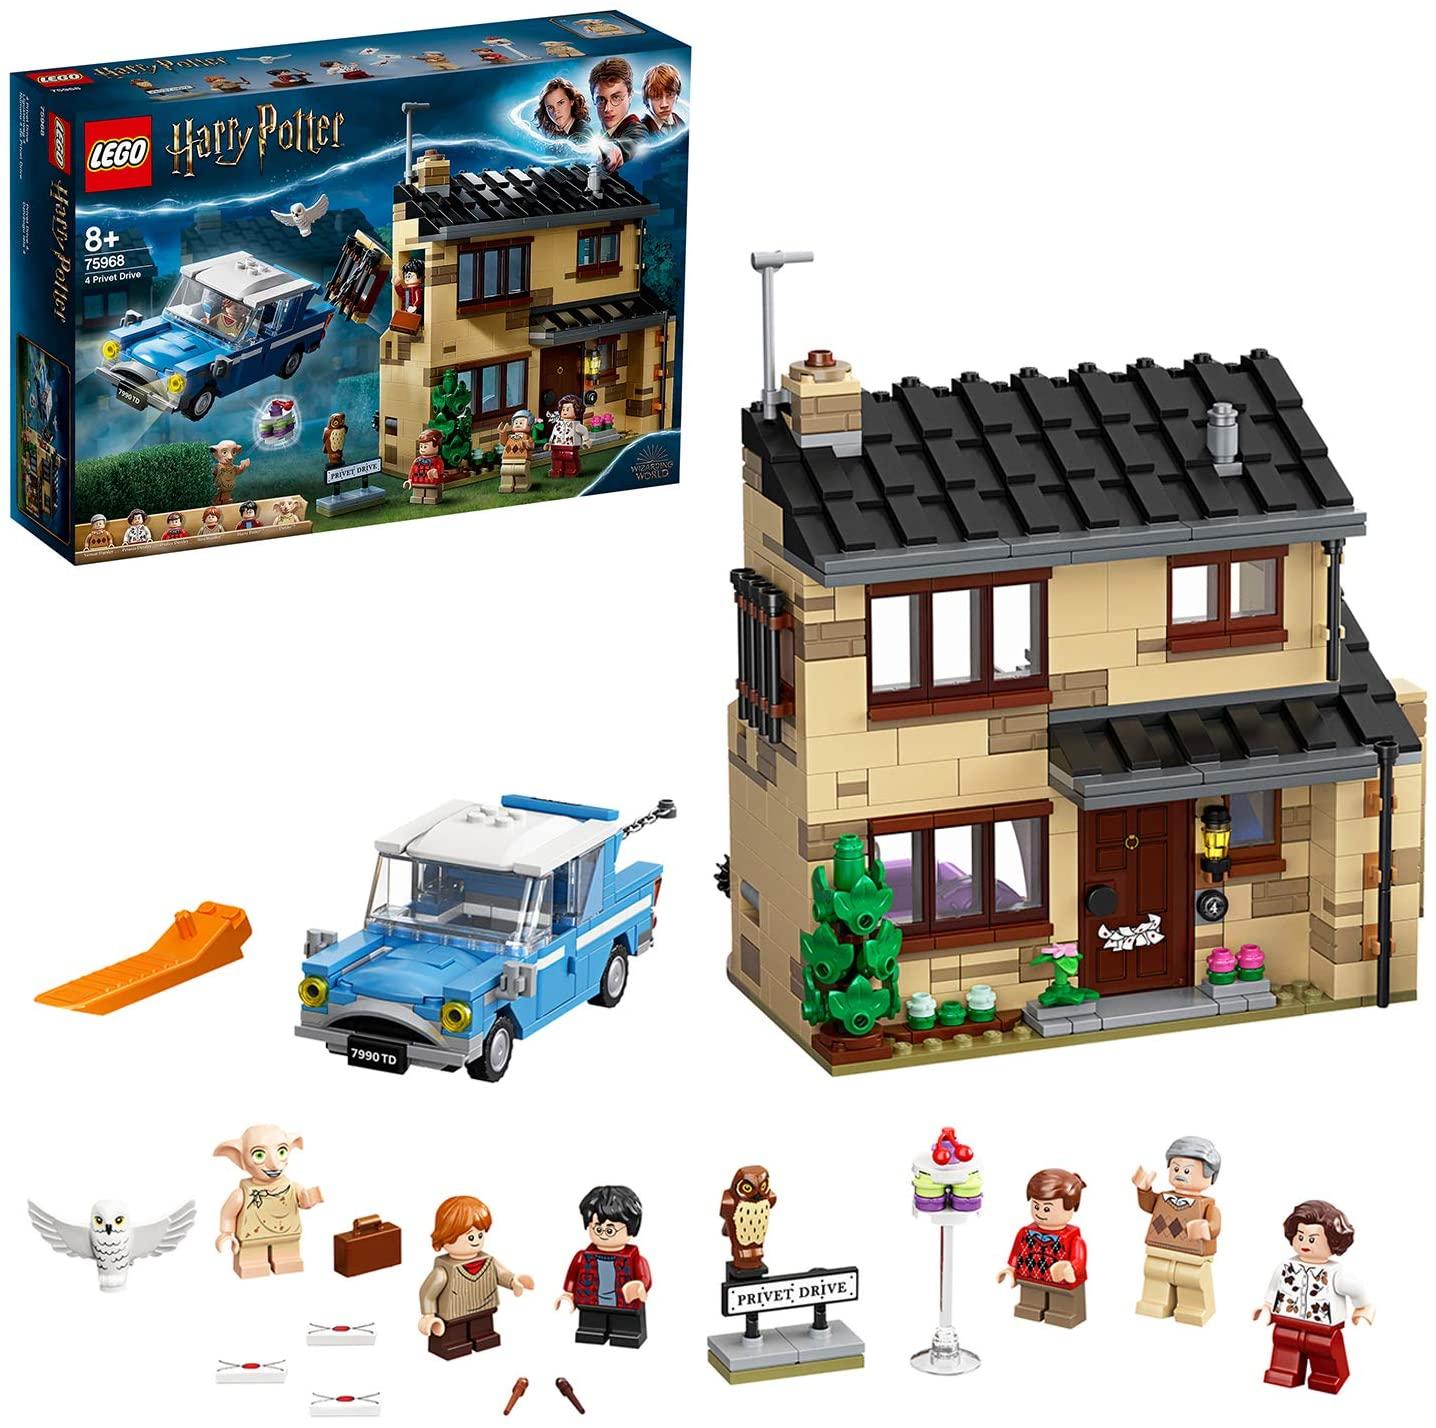 Jeu de construction Lego Harry Potter 4 75968 - Privet Drive